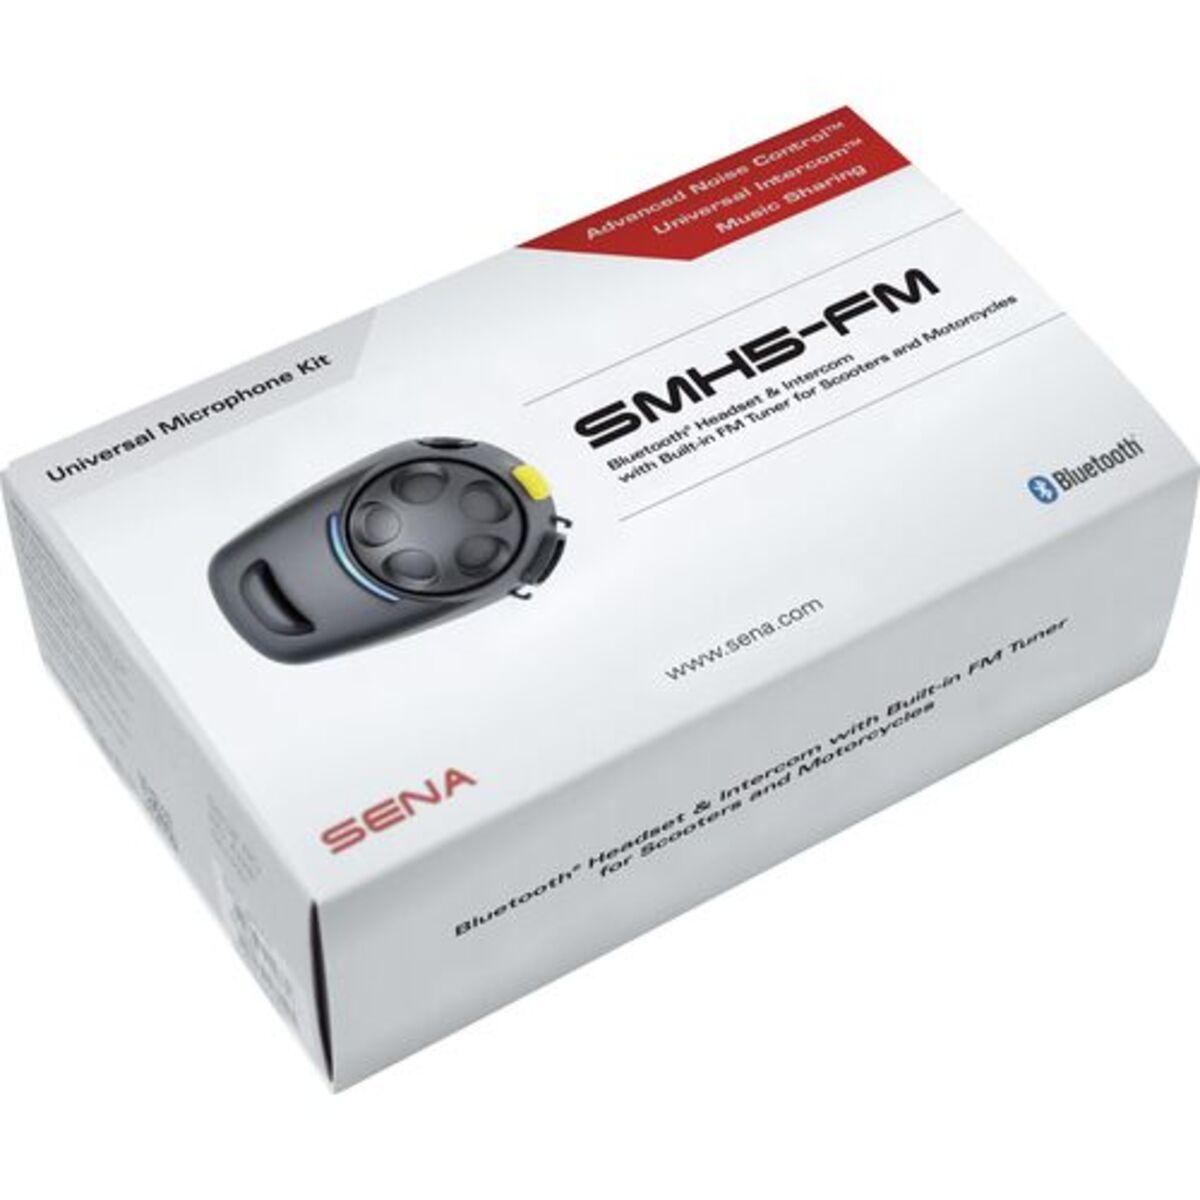 Bild 2 von Sena            SMH5-FM Bluetooth Headset Universal Dual Pack